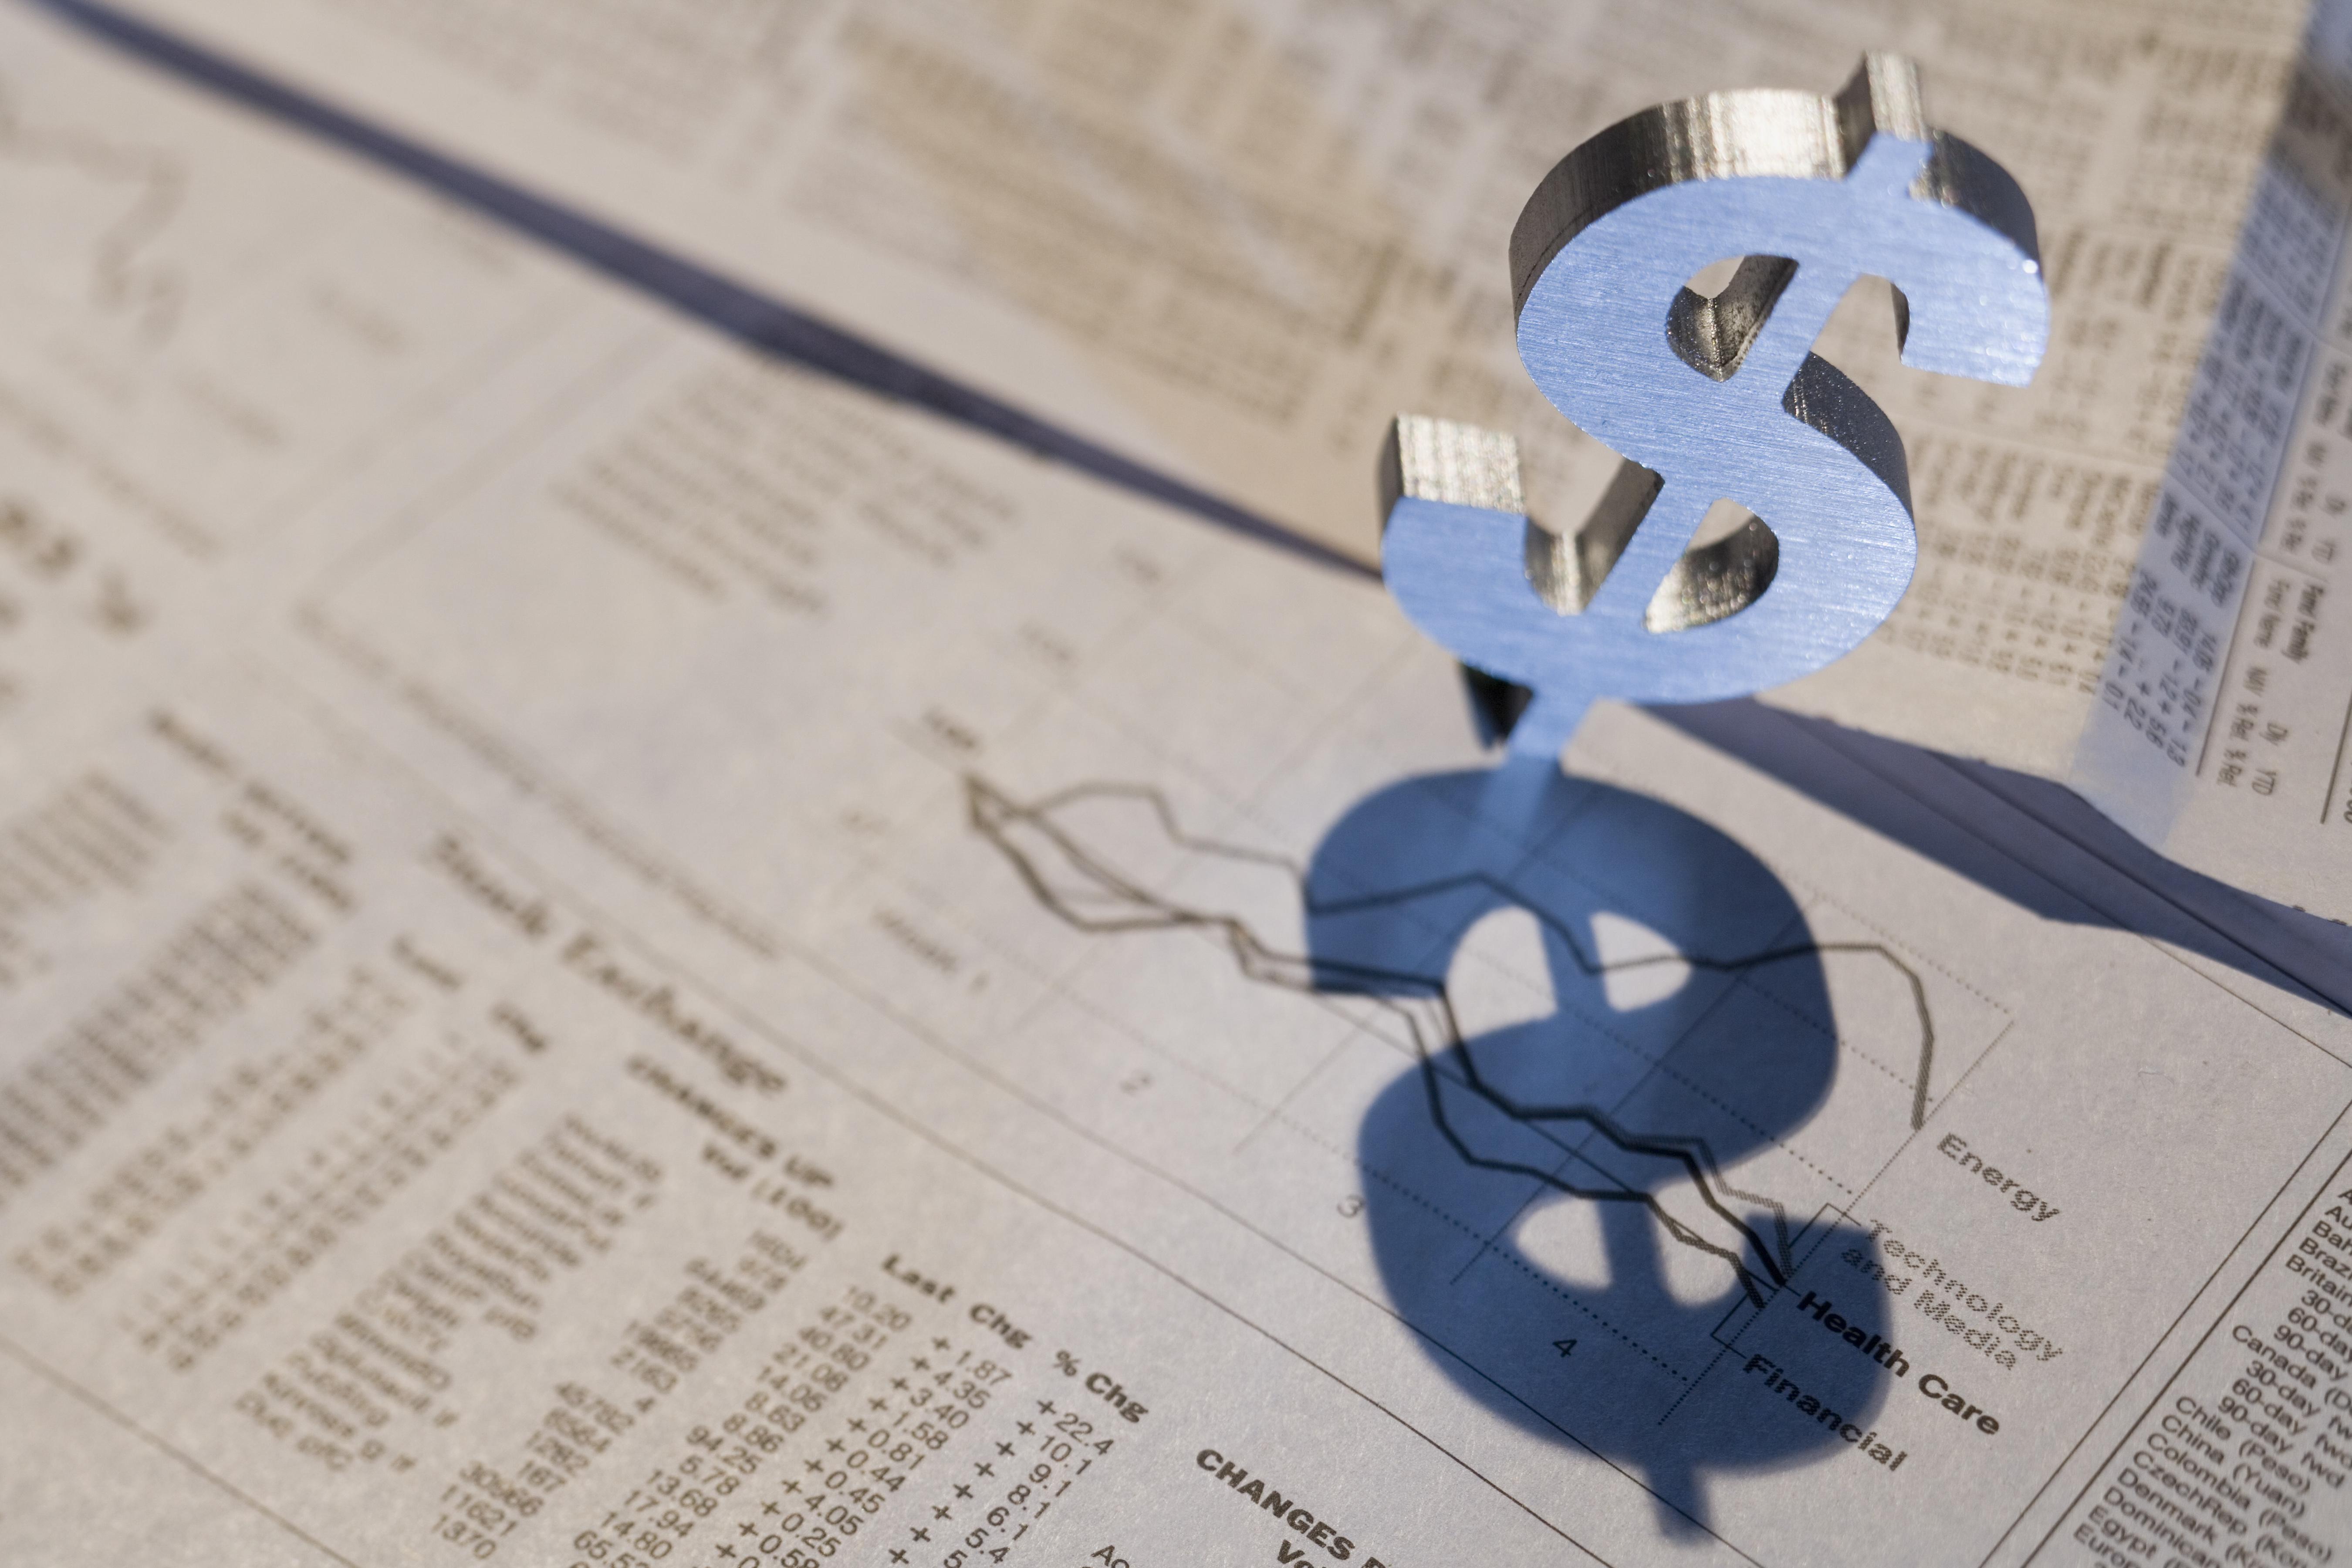 Coronavirus Bear Market: 5 Large-Cap Stocks to Buy | The Motley Fool